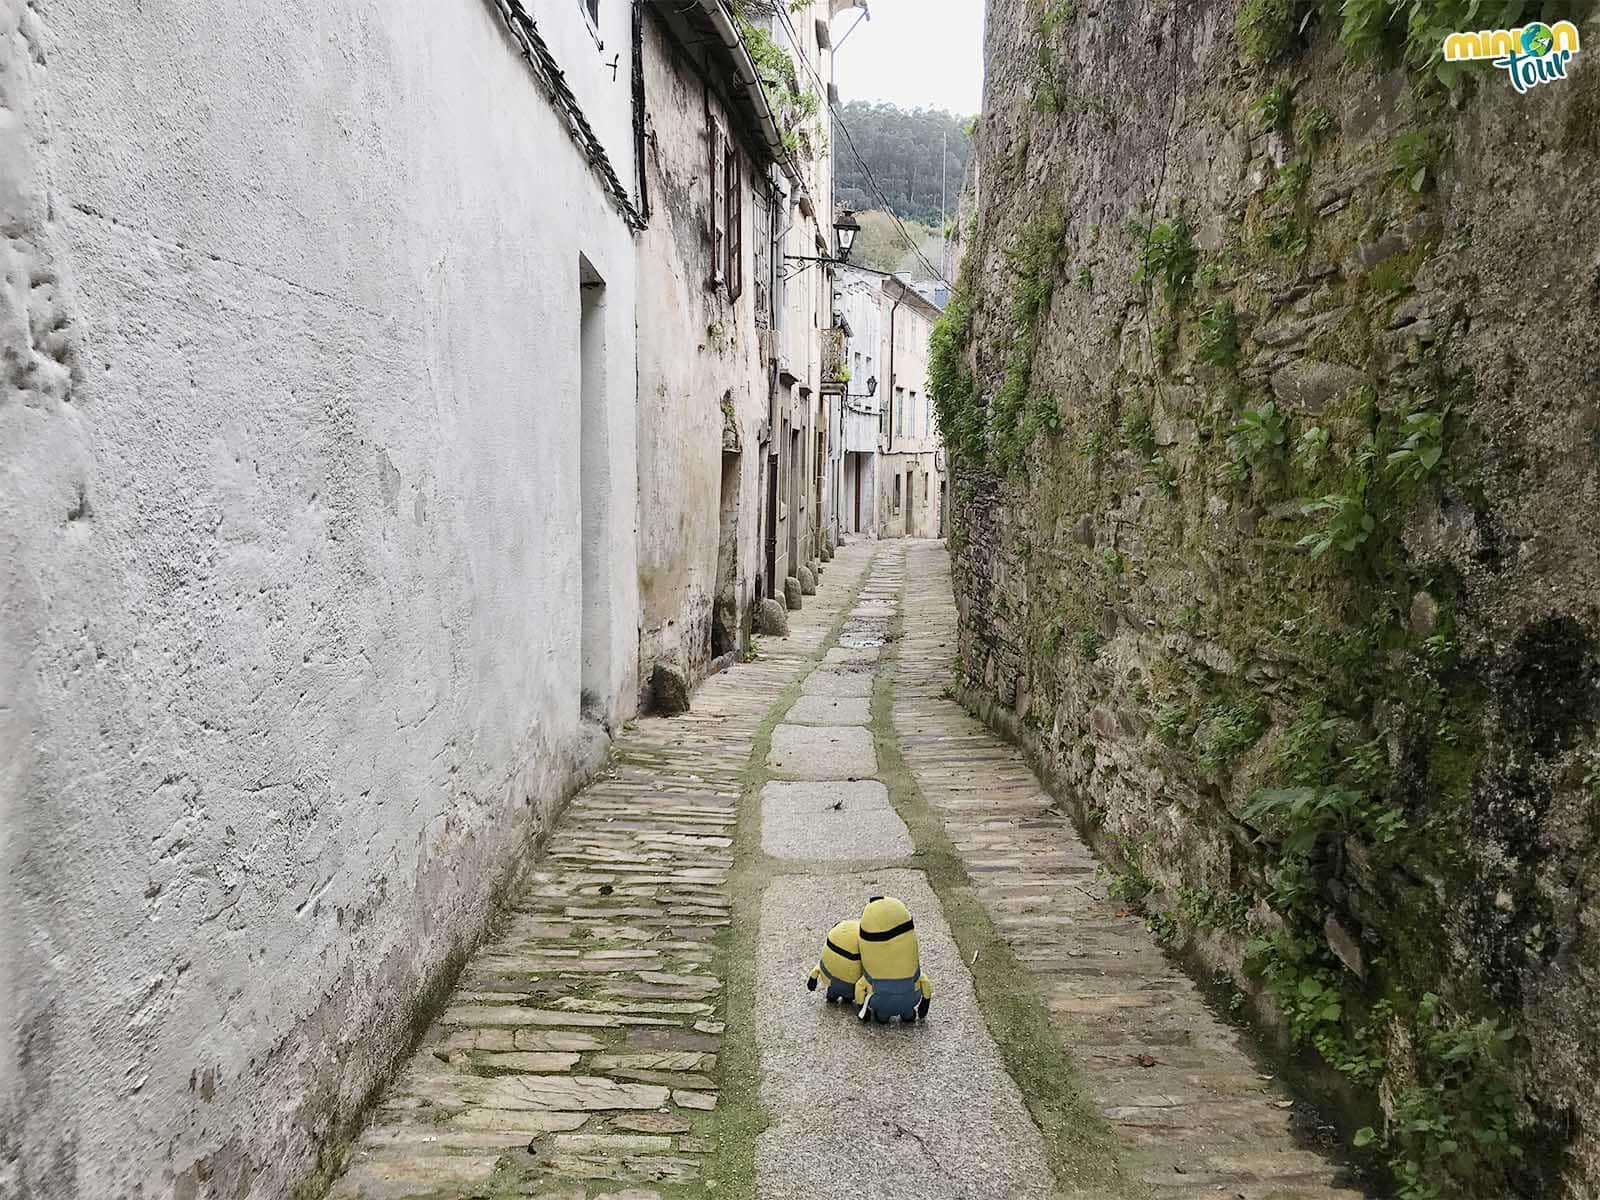 Minions paseando por la antigua muralla de Mondoñedo